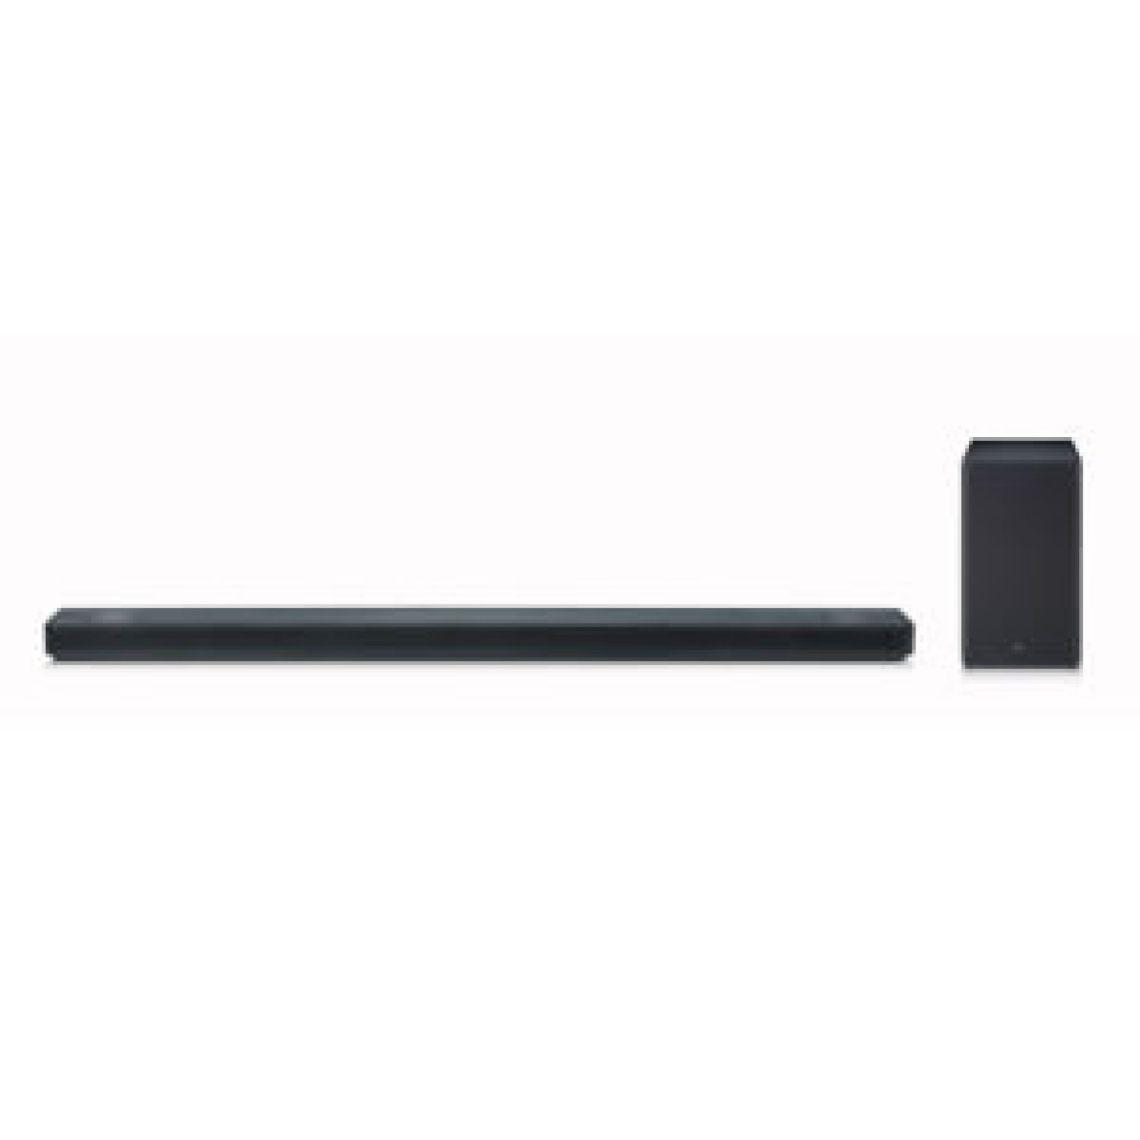 LG SK10Y 5.1.2-Channel Hi-Res Audio Soundbar with Dolby Atmos - (SK10Y) 719192617810 | eBay